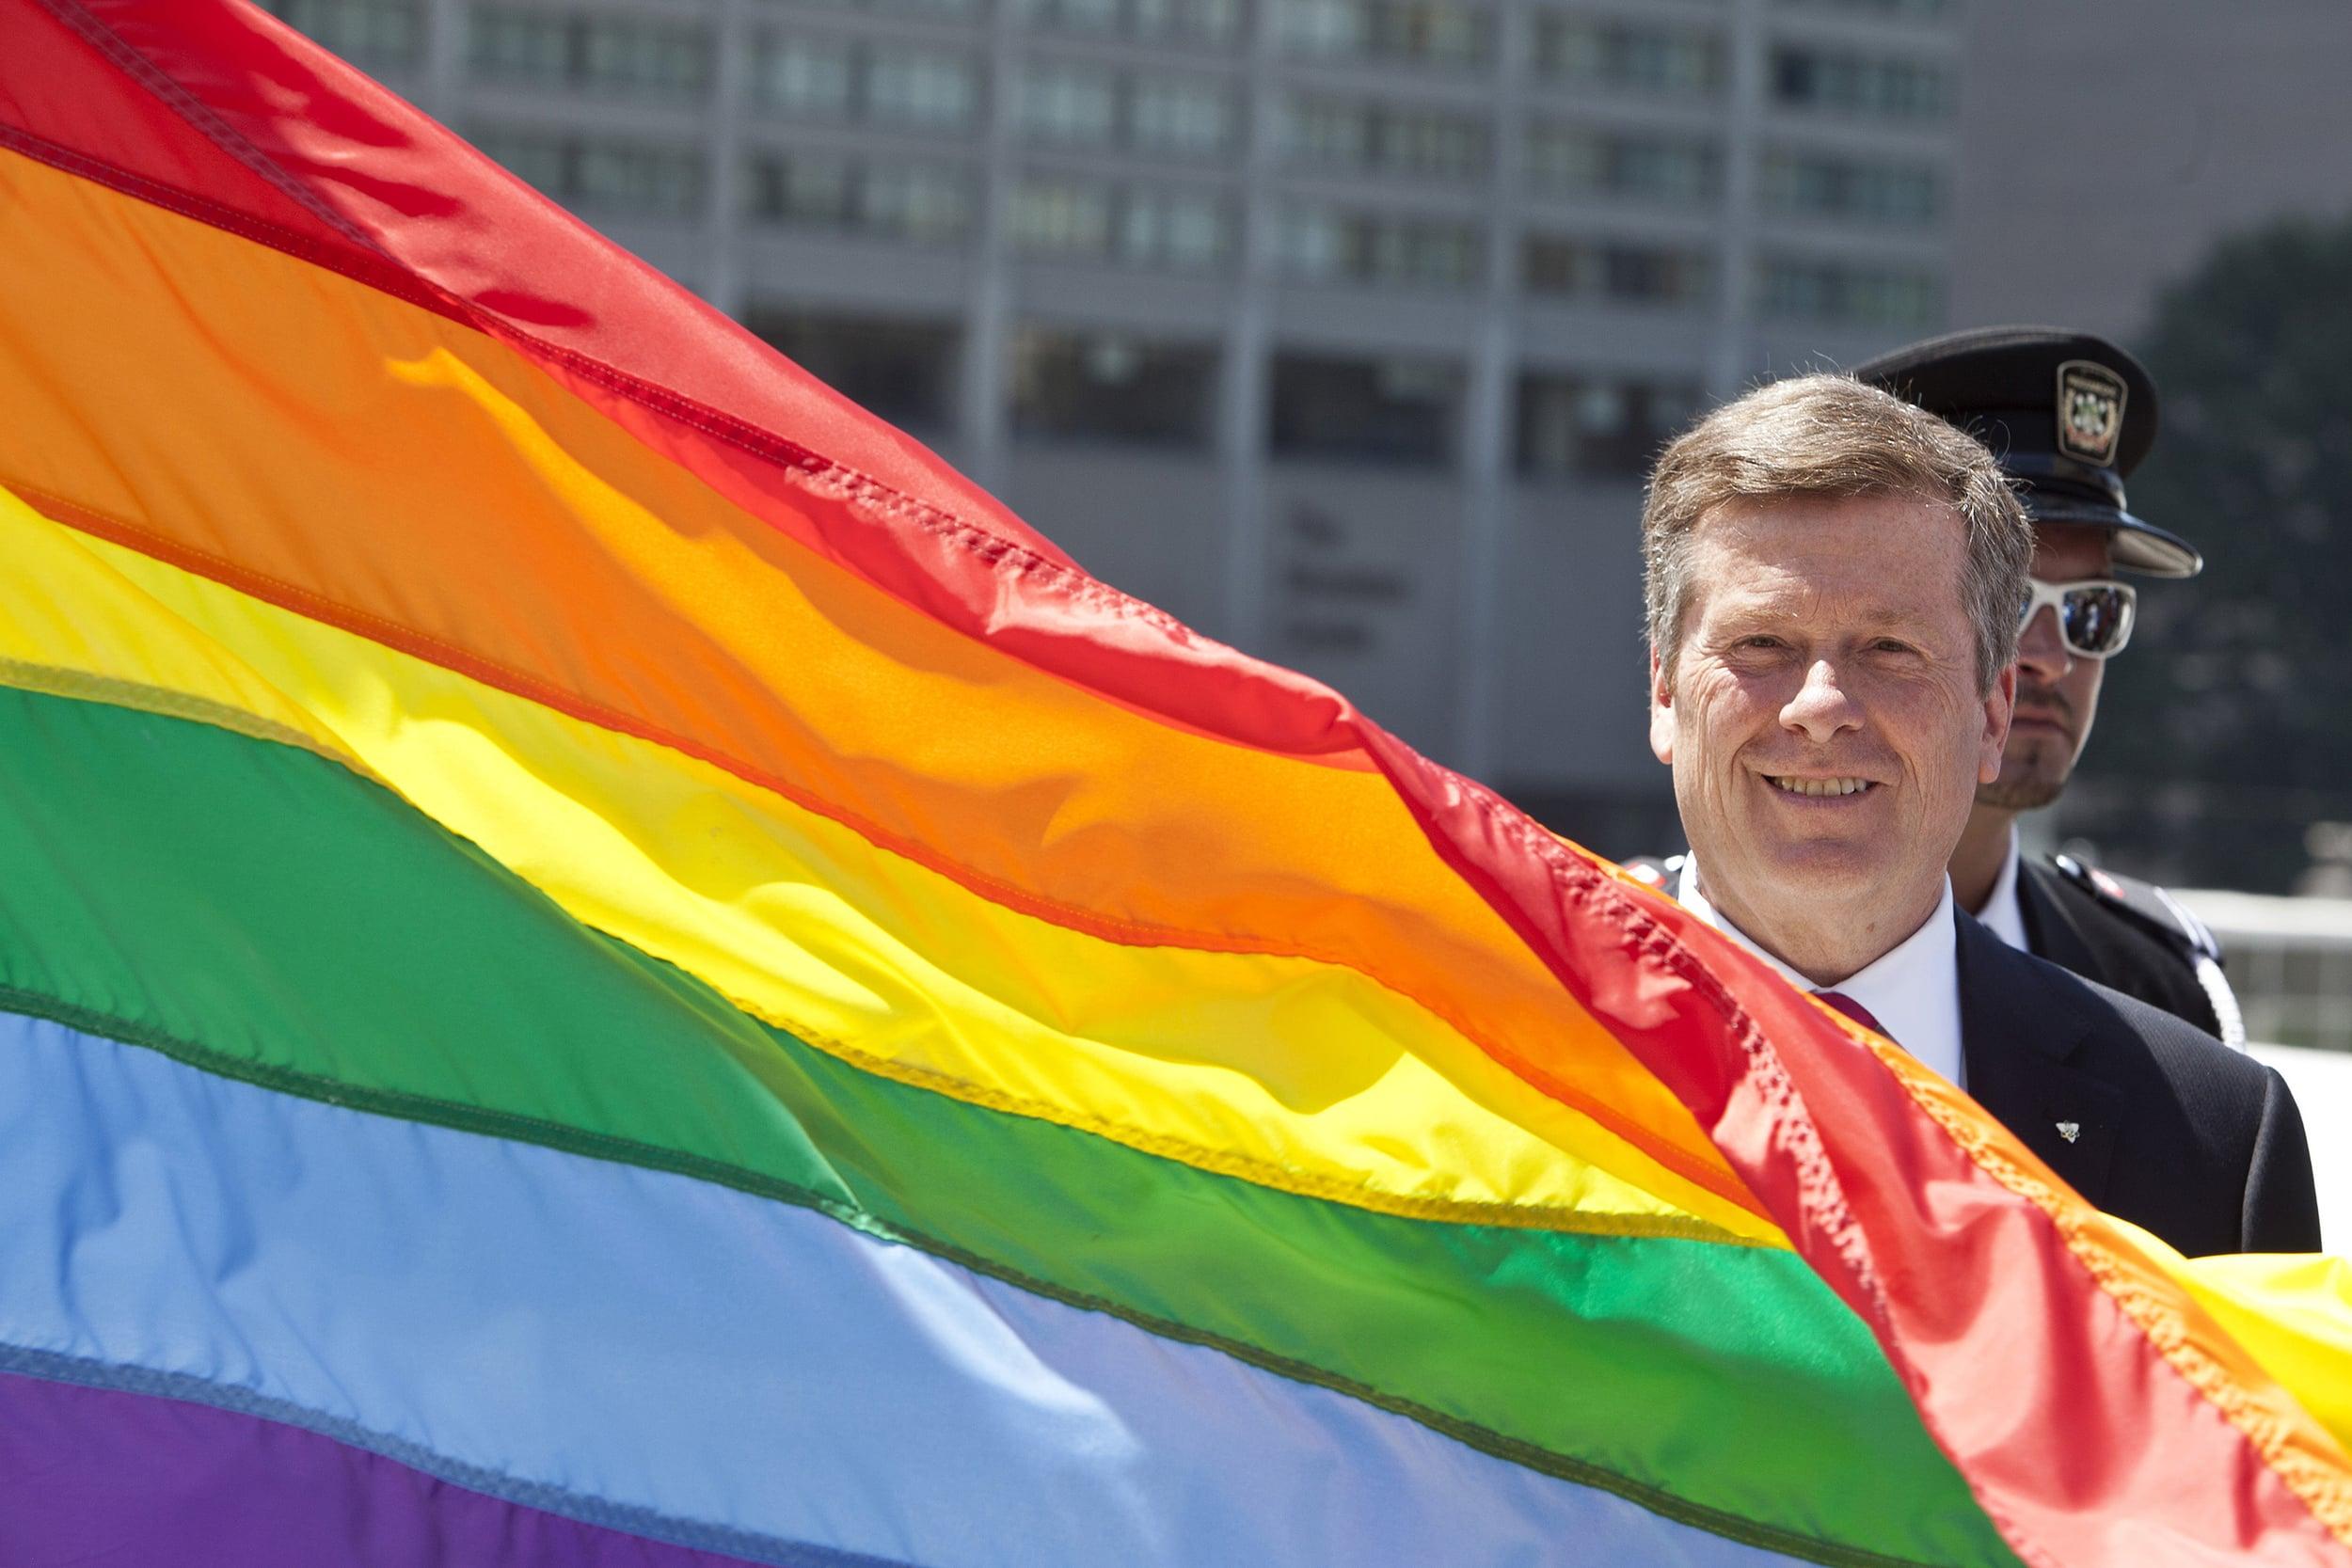 Toronto Mayor John Tory raises the Pride flag at Toronto city hall.